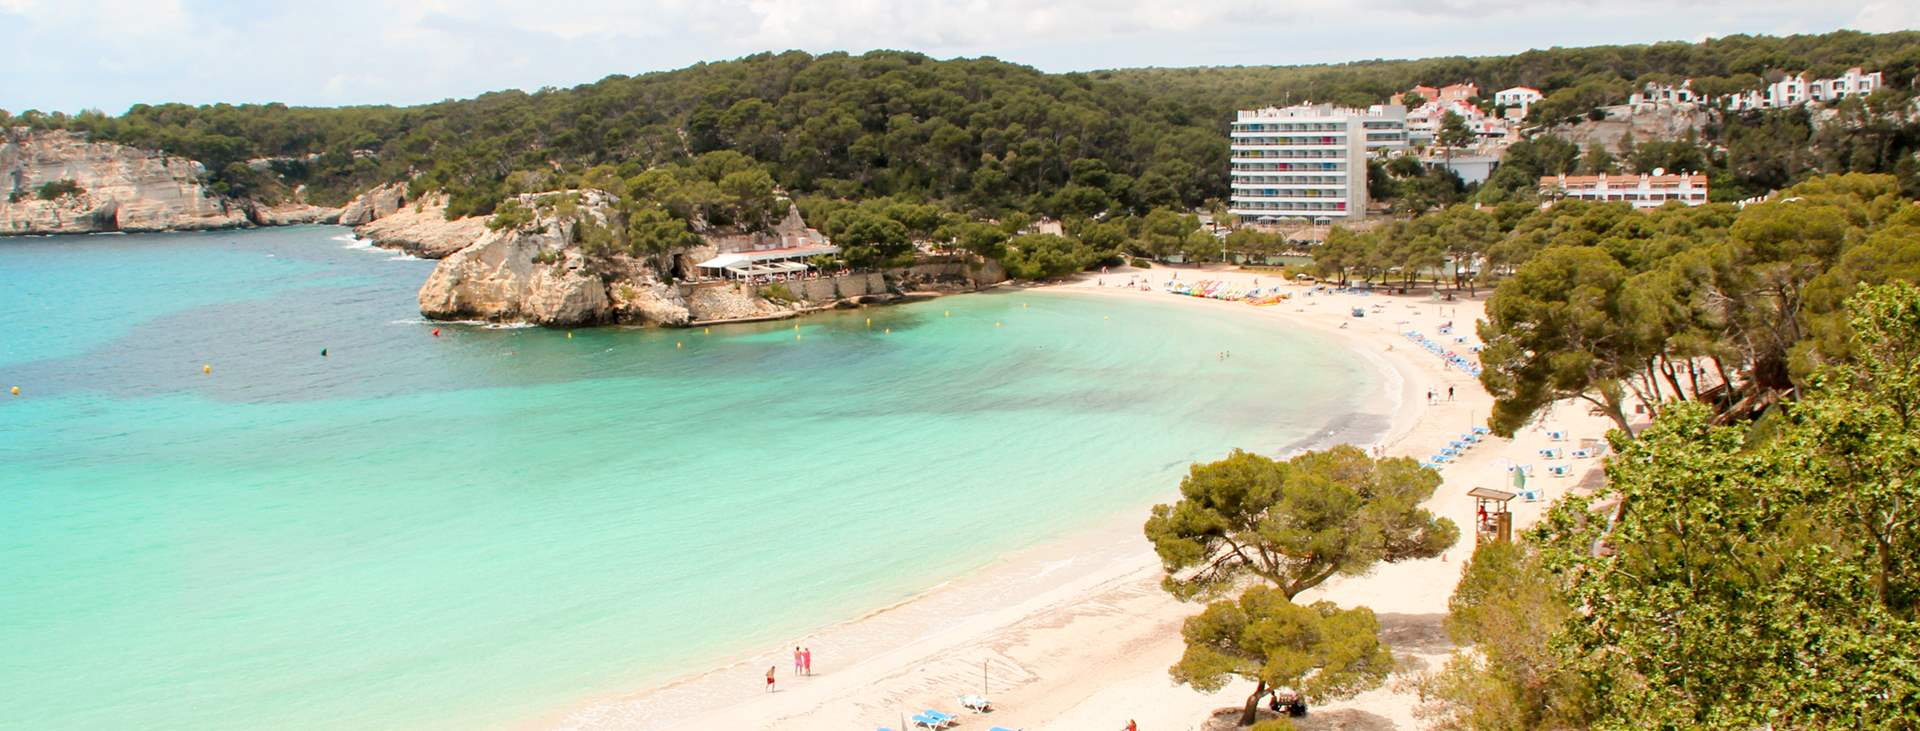 Bestill en reise til Cala Galdana på Menorca med Ving